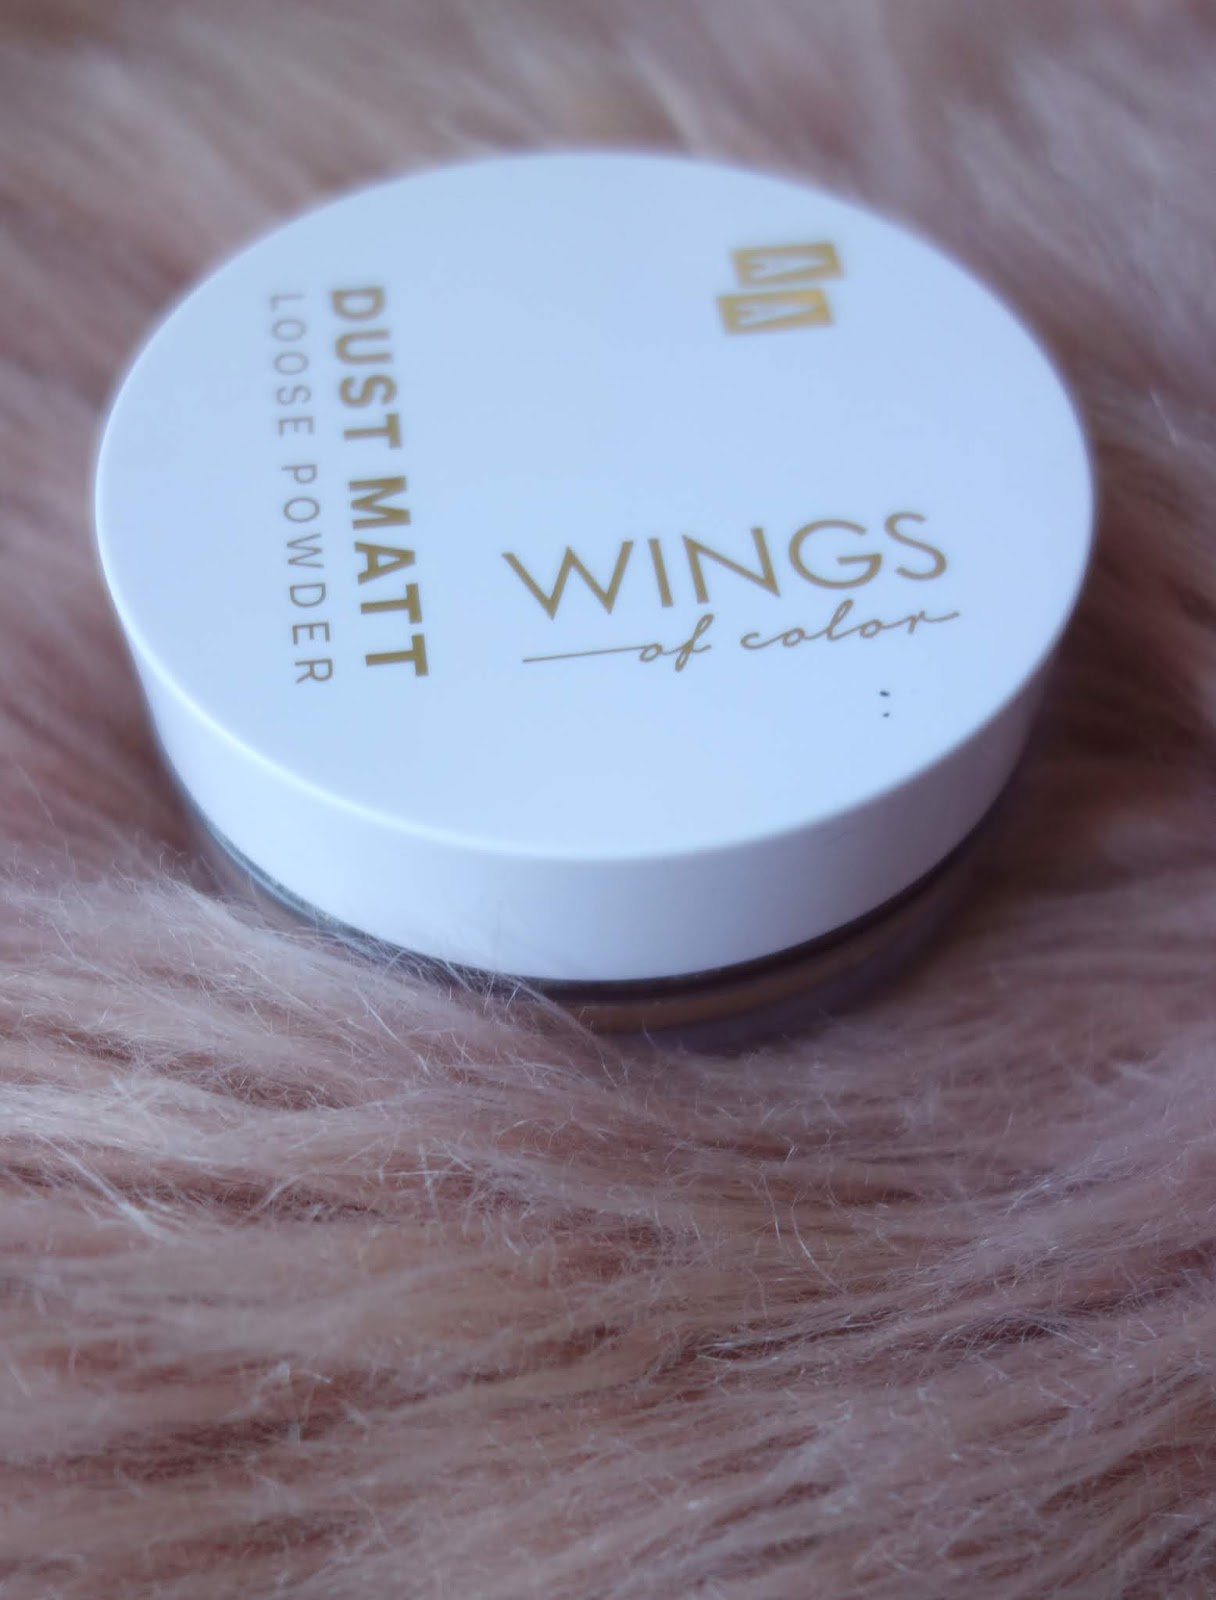 AA Wings of Color Dust Matte Loose Powder | Najlepszy puder sypki z drogerii? Efekt Photoshopa?